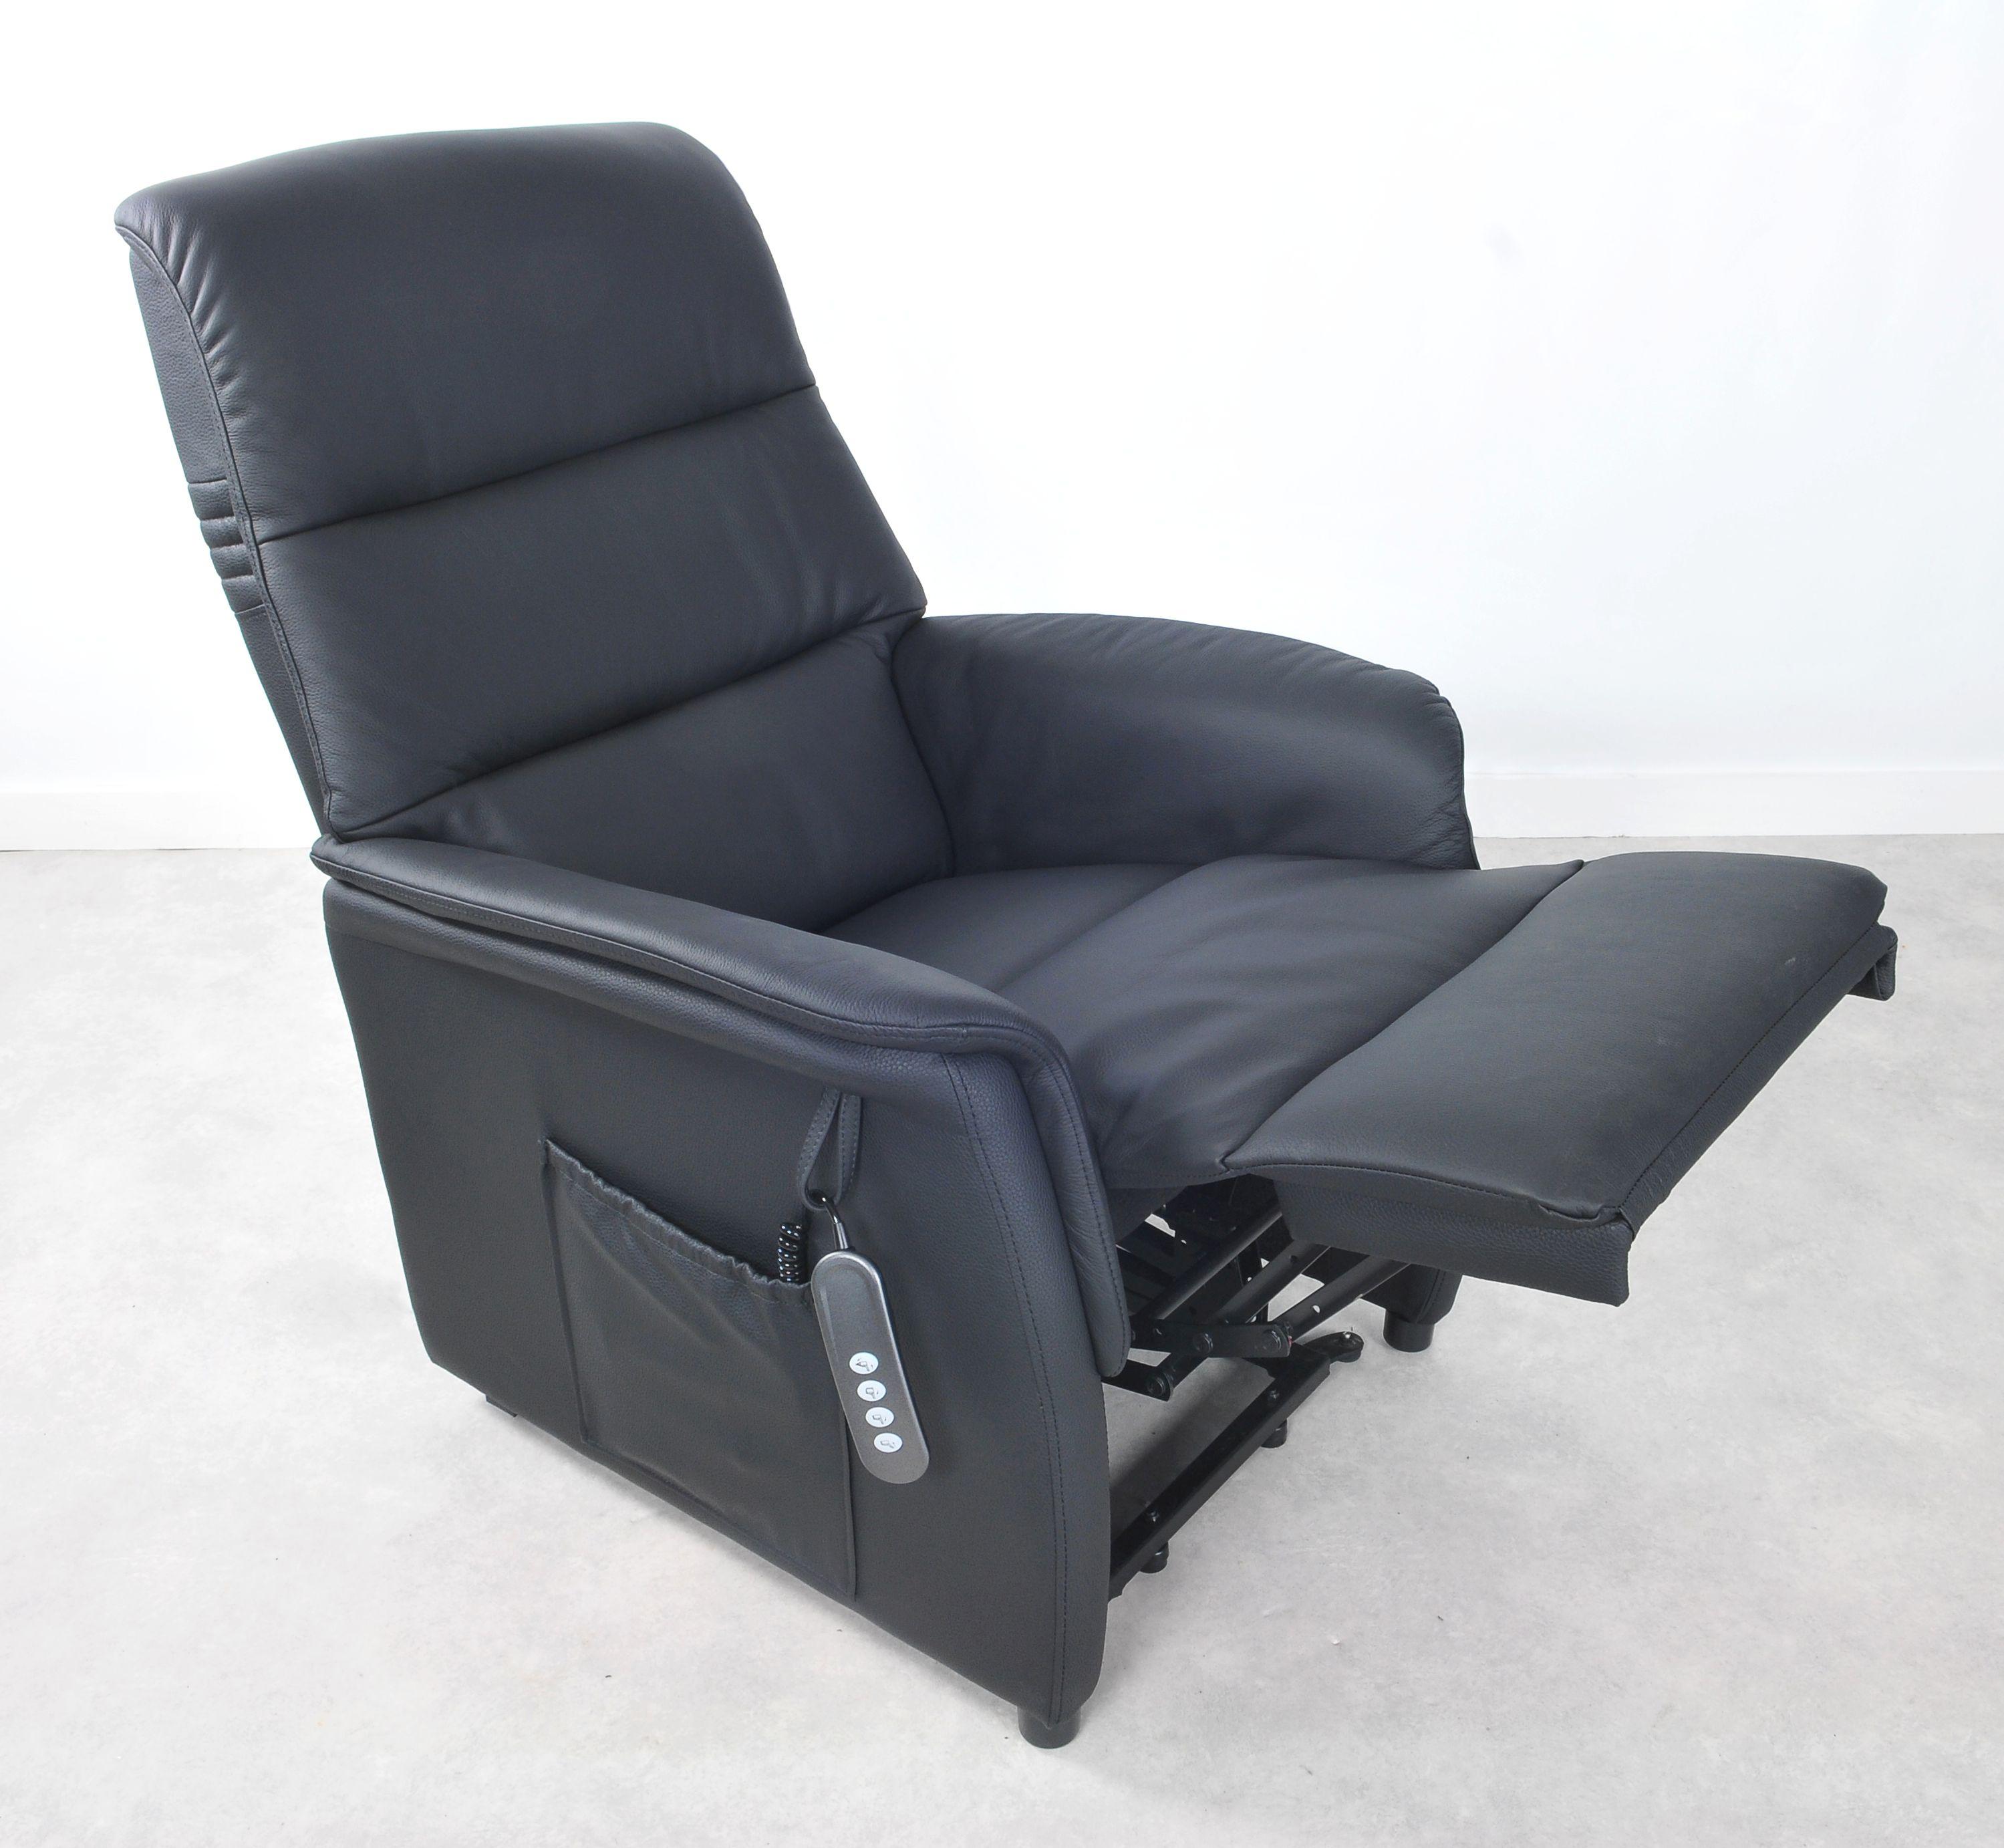 Riser recliner chair W 176